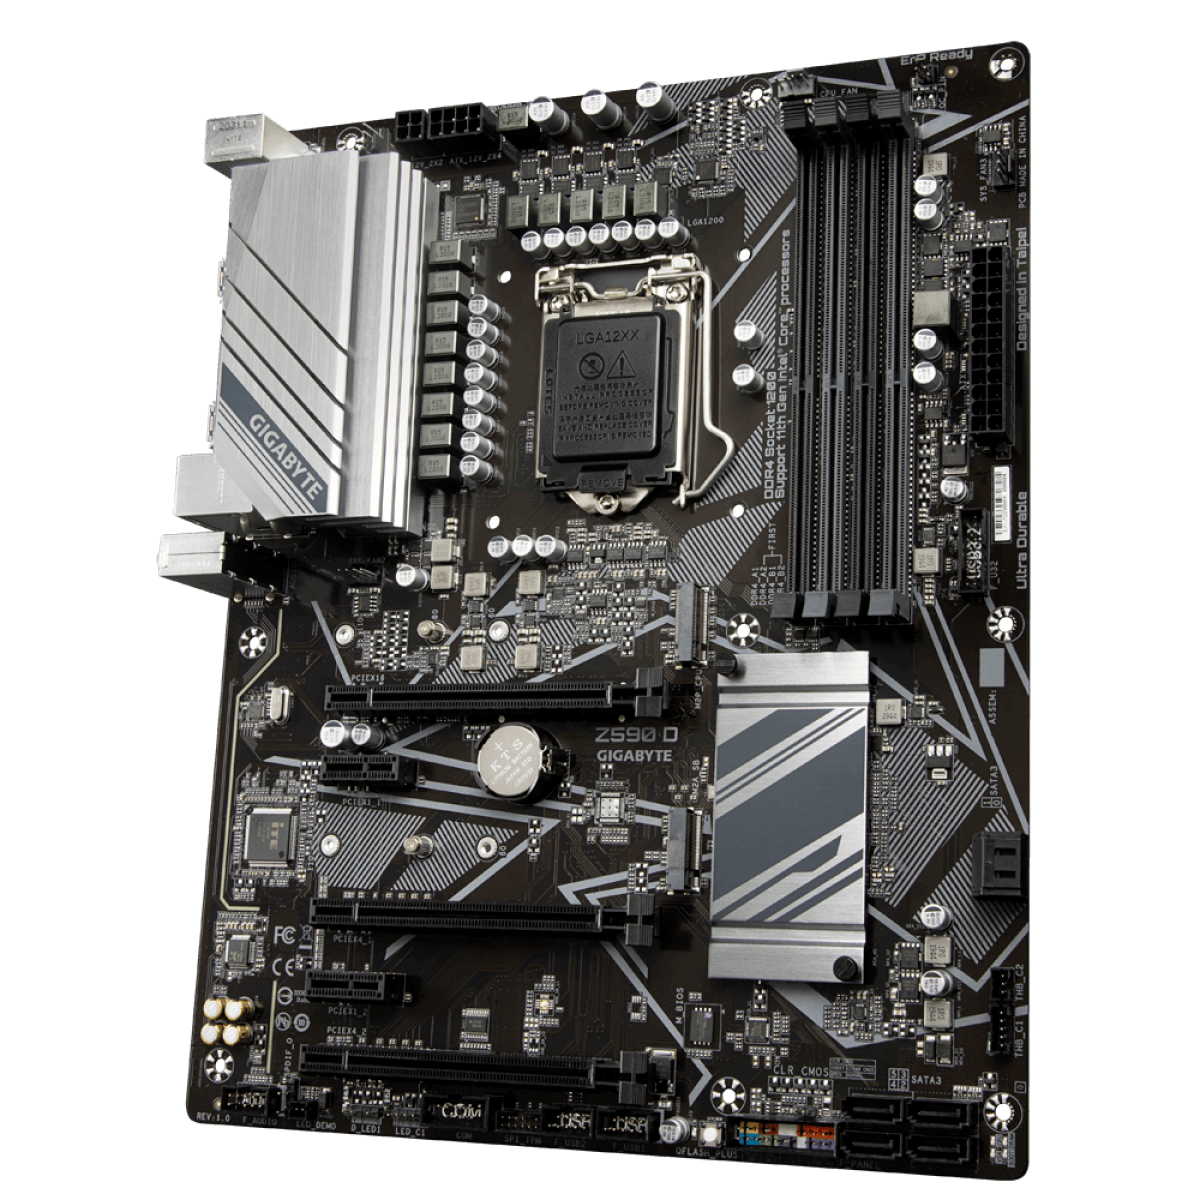 Placa Mãe GIGABYTE Z590 D (rev. 1.0), Intel Z590 Express Chipset, Socket 1200, ATX, DDR4